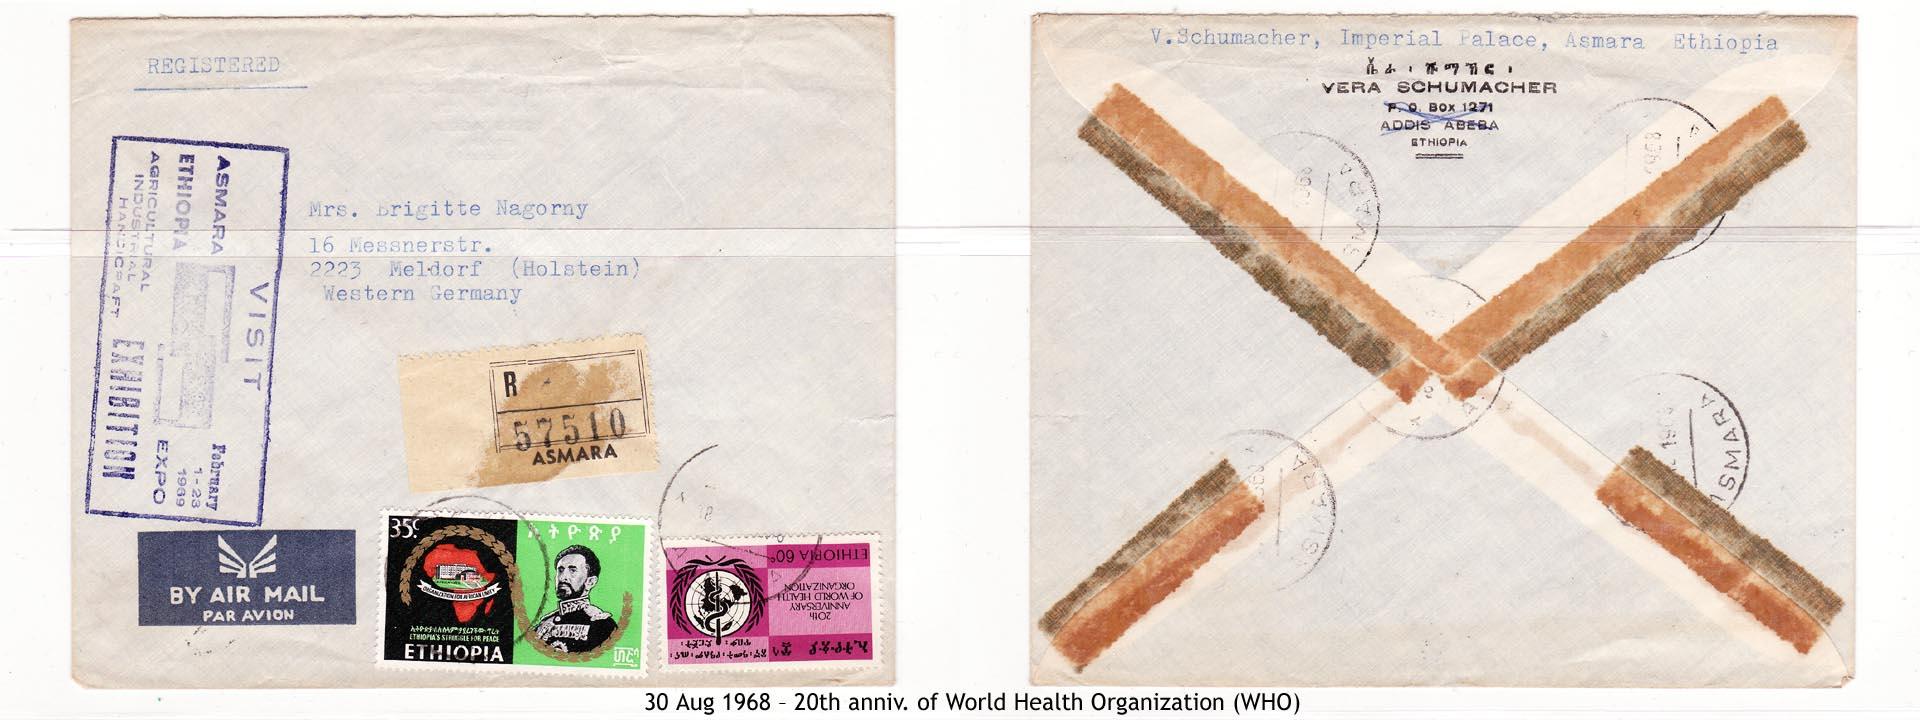 19680830 – 20th anniv. of World Health Organization (WHO)